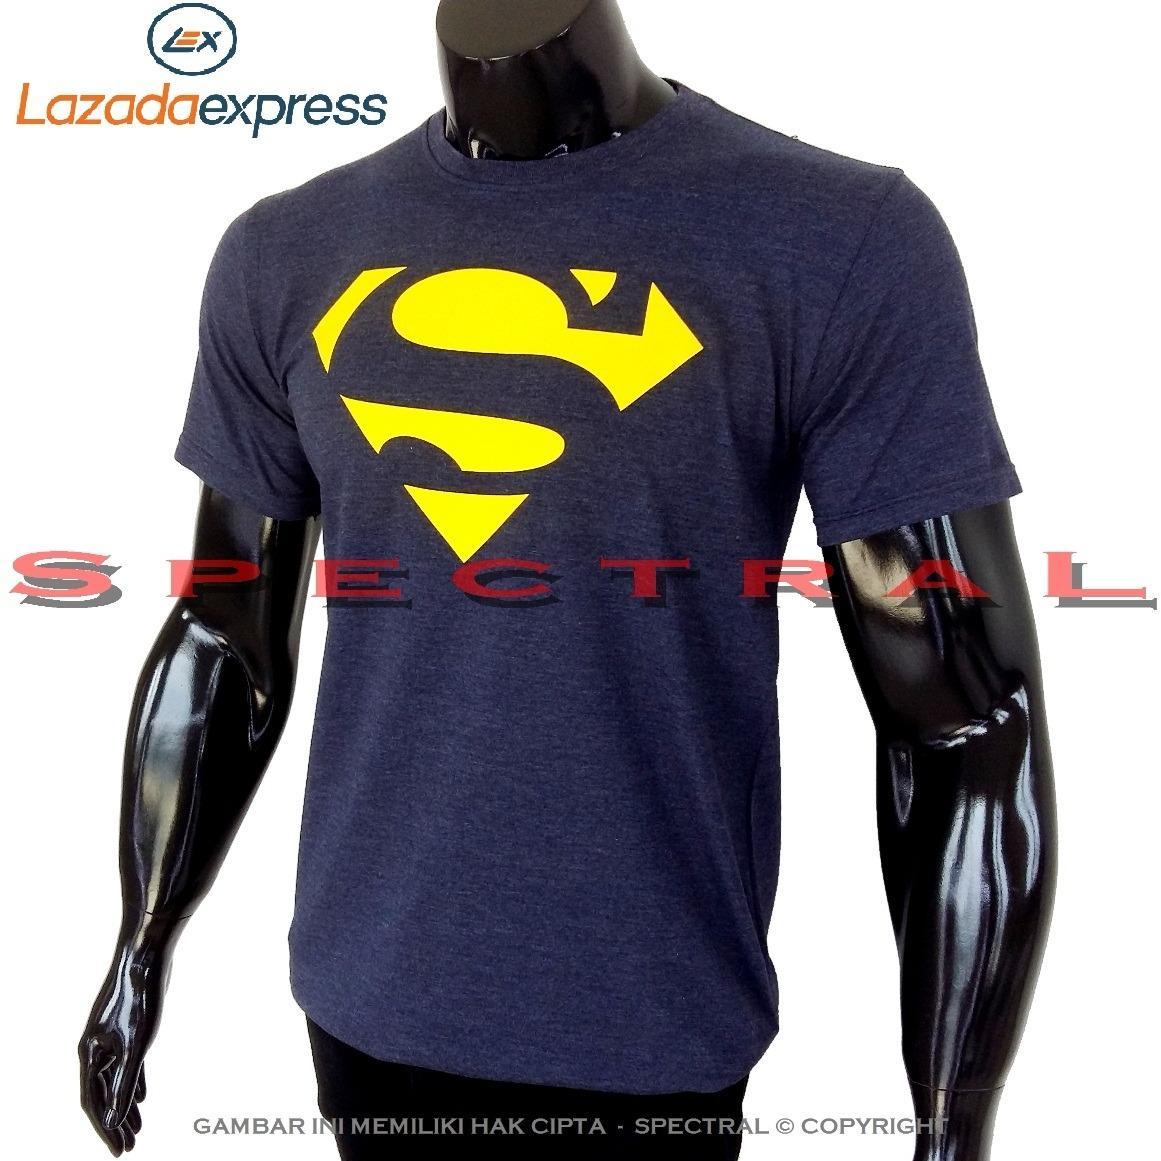 Spectral – SUPERMAN NAVY 100% Soft Cotton Combed 30s Kaos Distro Fashion T- Shirt Atasan Oblong Baju Pakaian Polos Shirt Pria Wanita Cewe Cowo Lengan Murah ...